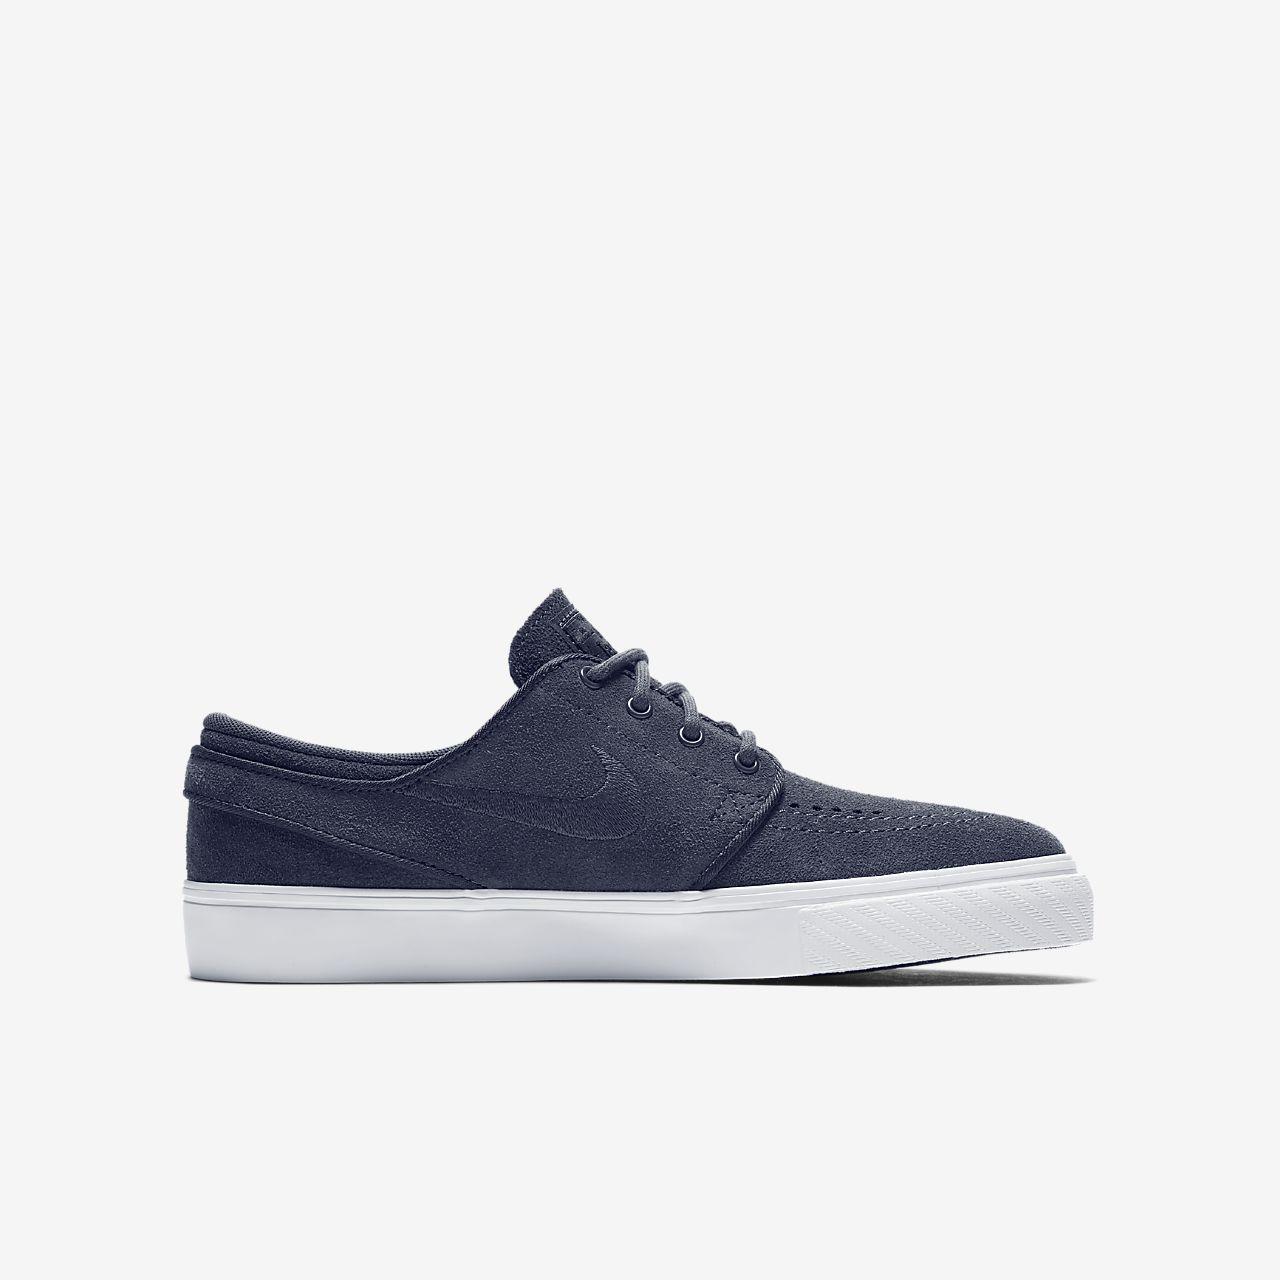 Chaussures Nike SB Collection Stefan Janoski grises Skater garçon Chung Shi Dux Trainer  35.5 EU WqXKck9V